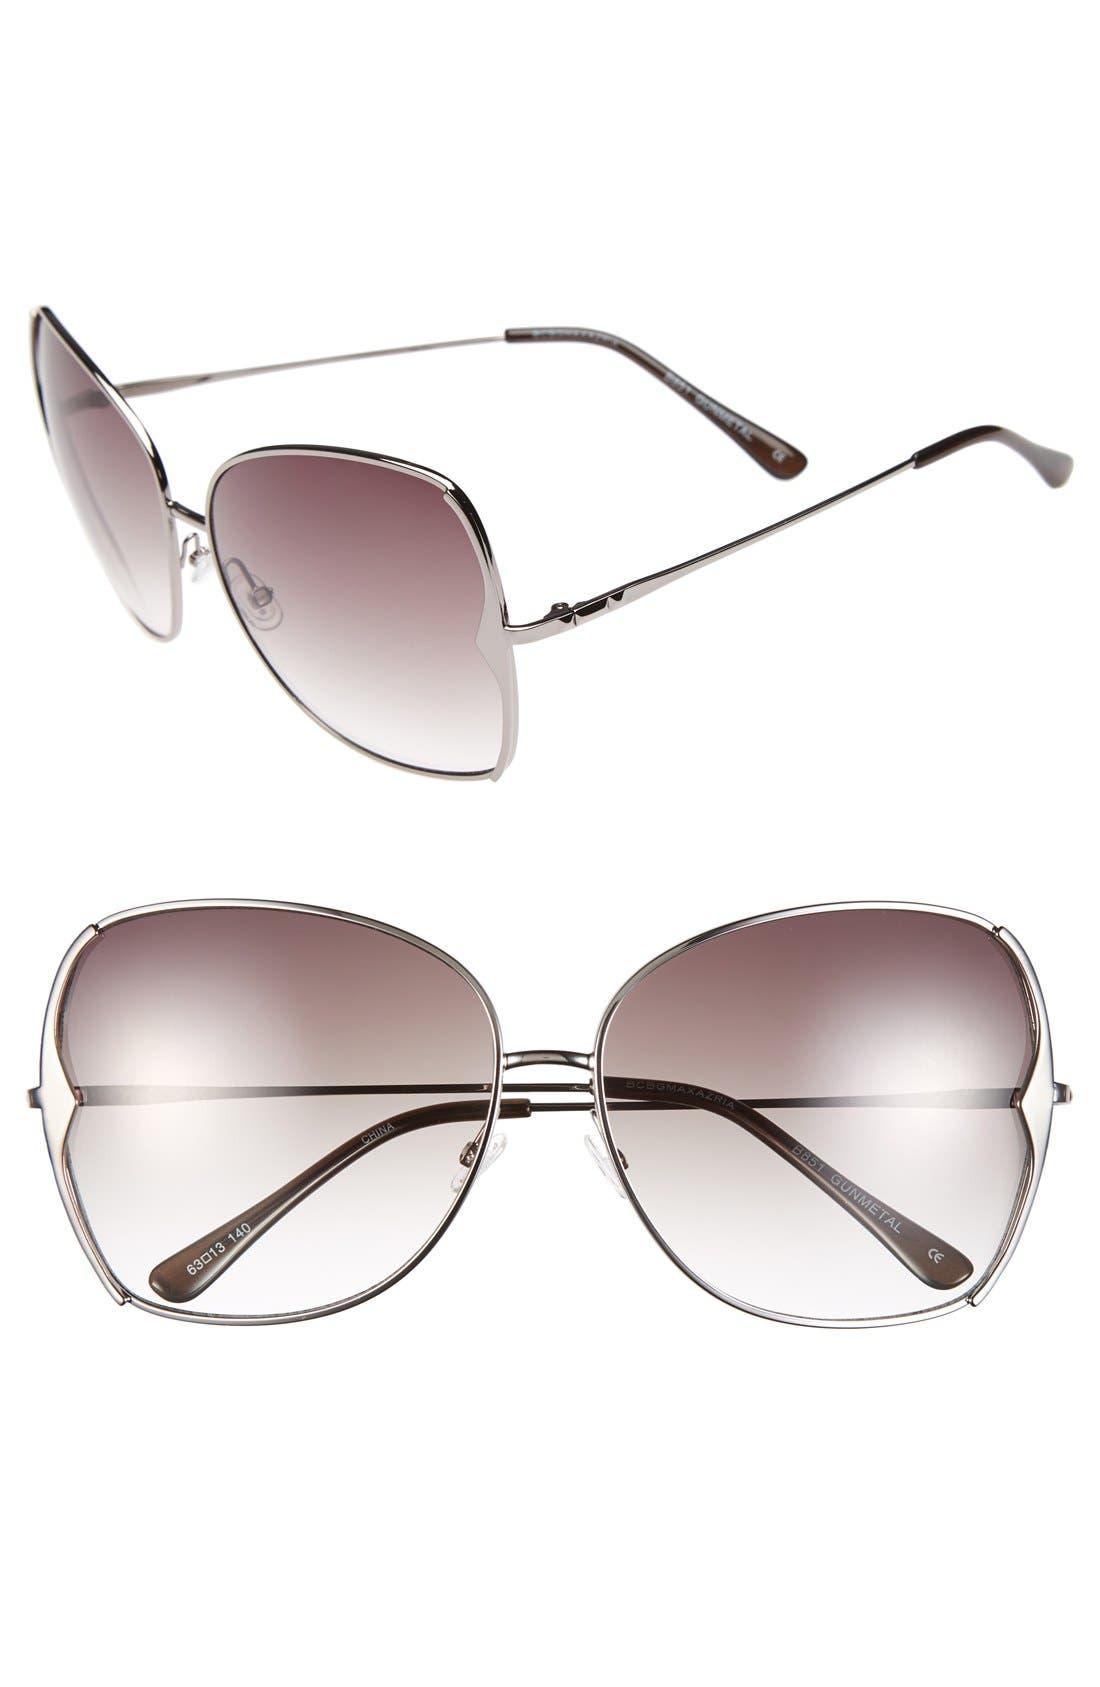 BCBGMAXAZRIA, 63mm Butterfly Sunglasses, Main thumbnail 1, color, 020